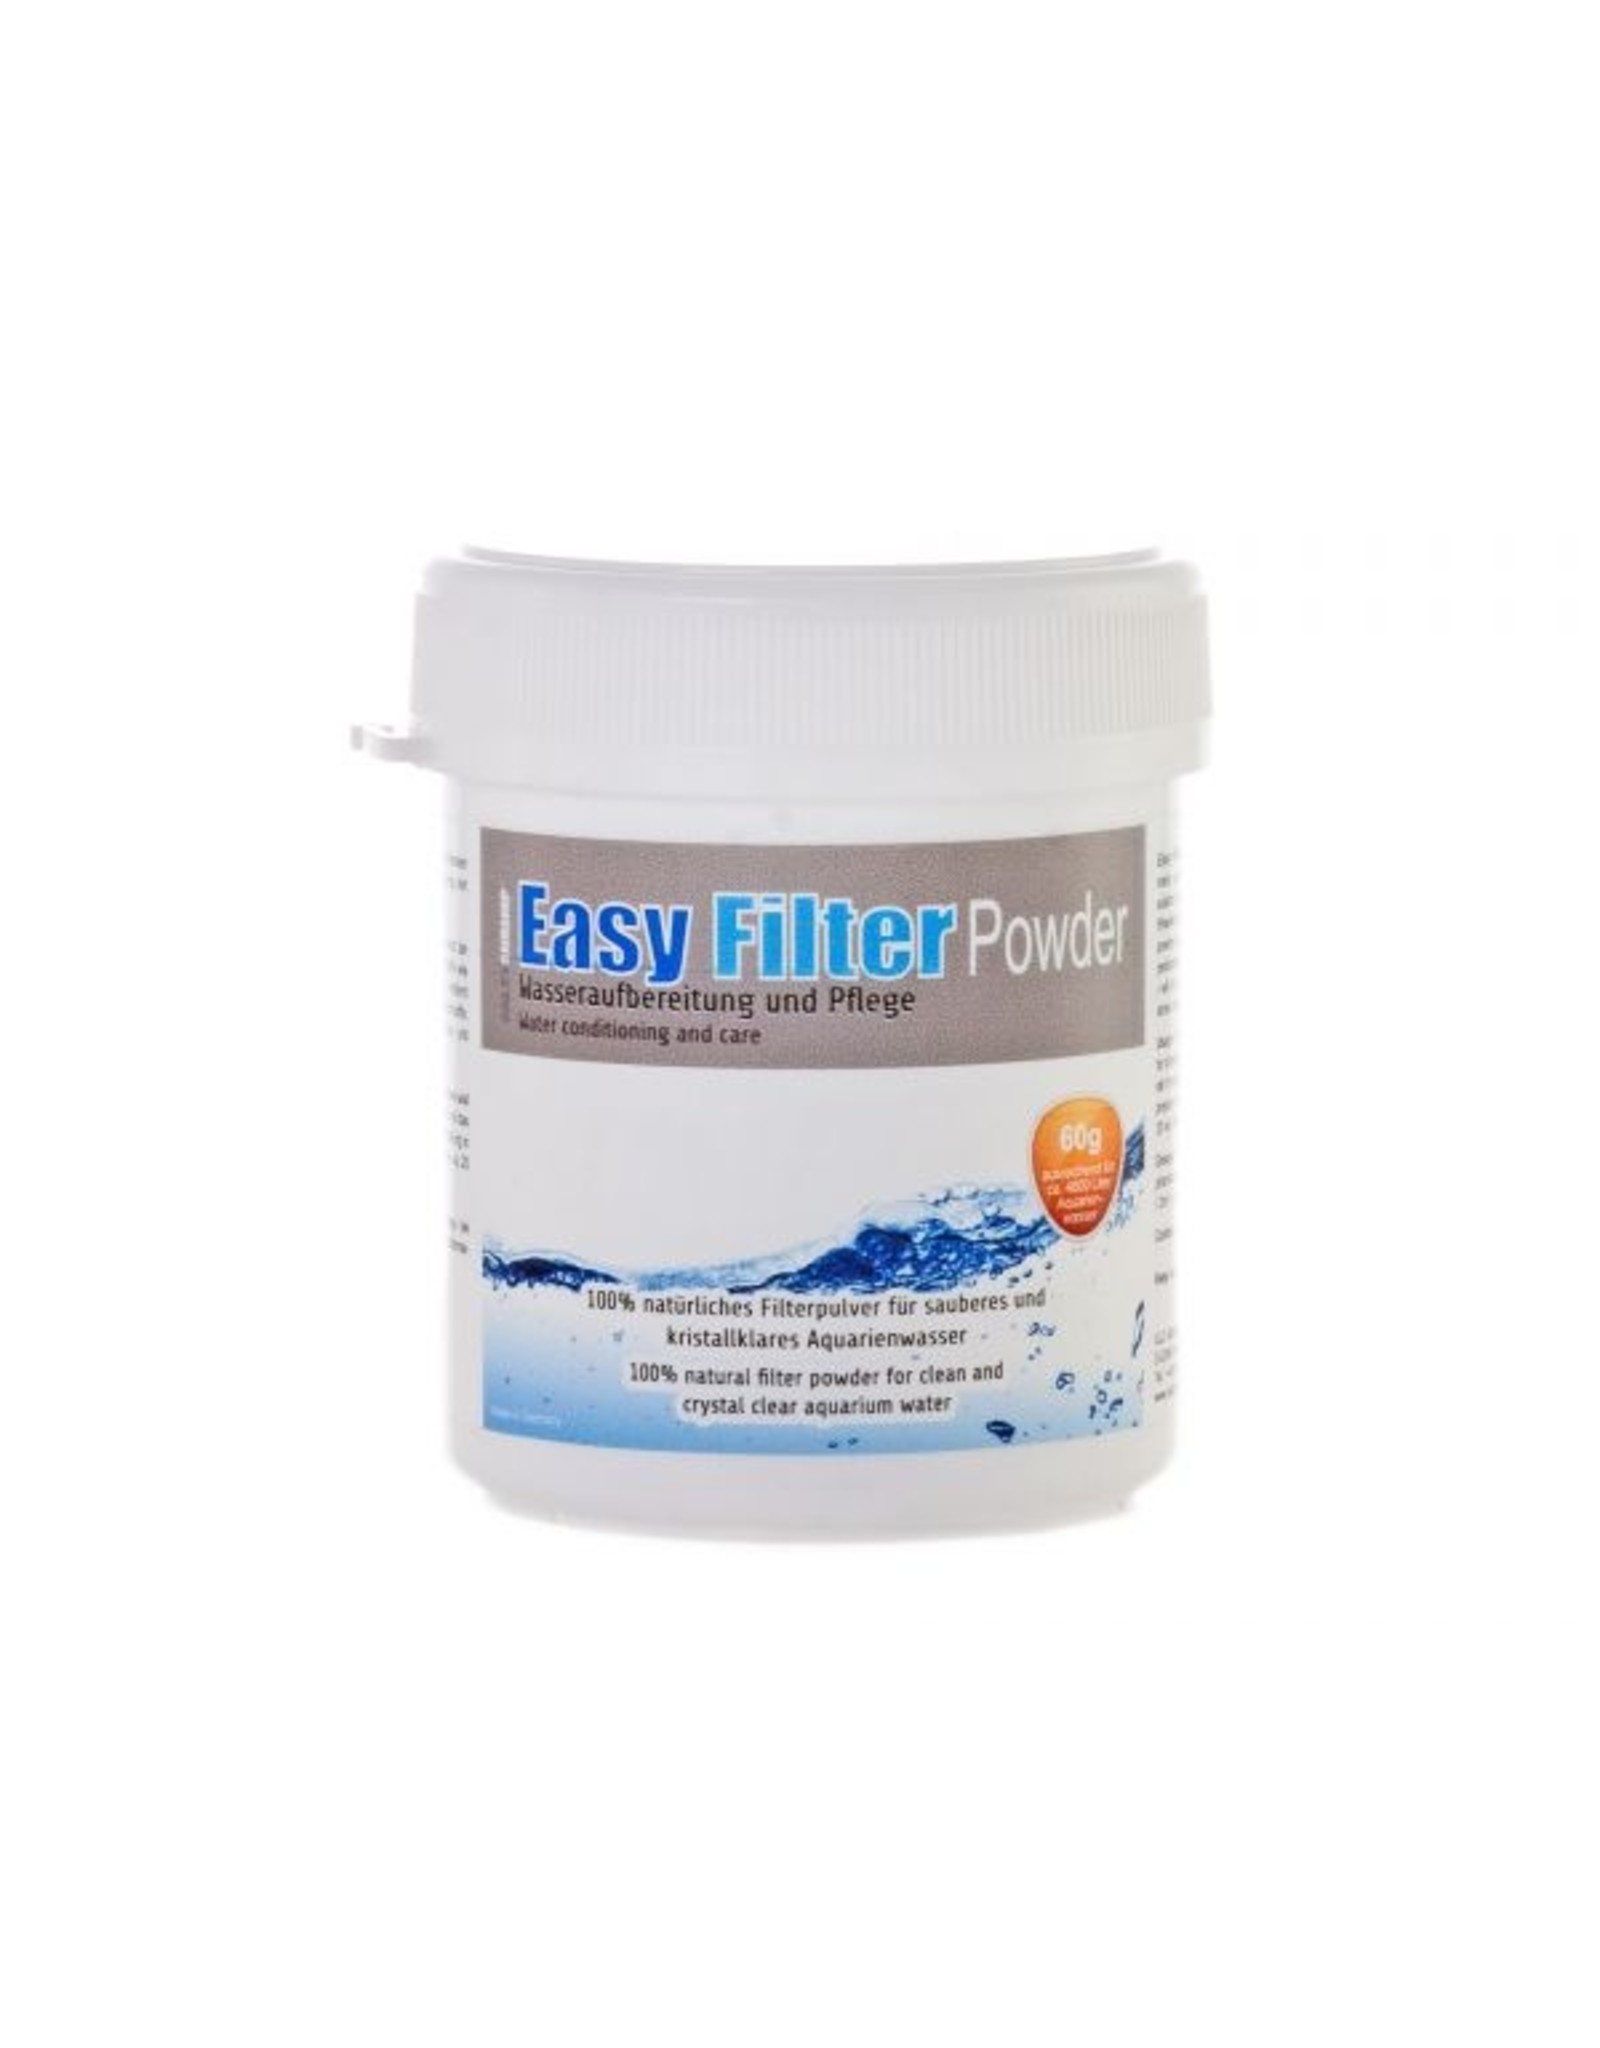 SaltyShrimp SALTYSHRIMP - Easy Filter Powder 60g